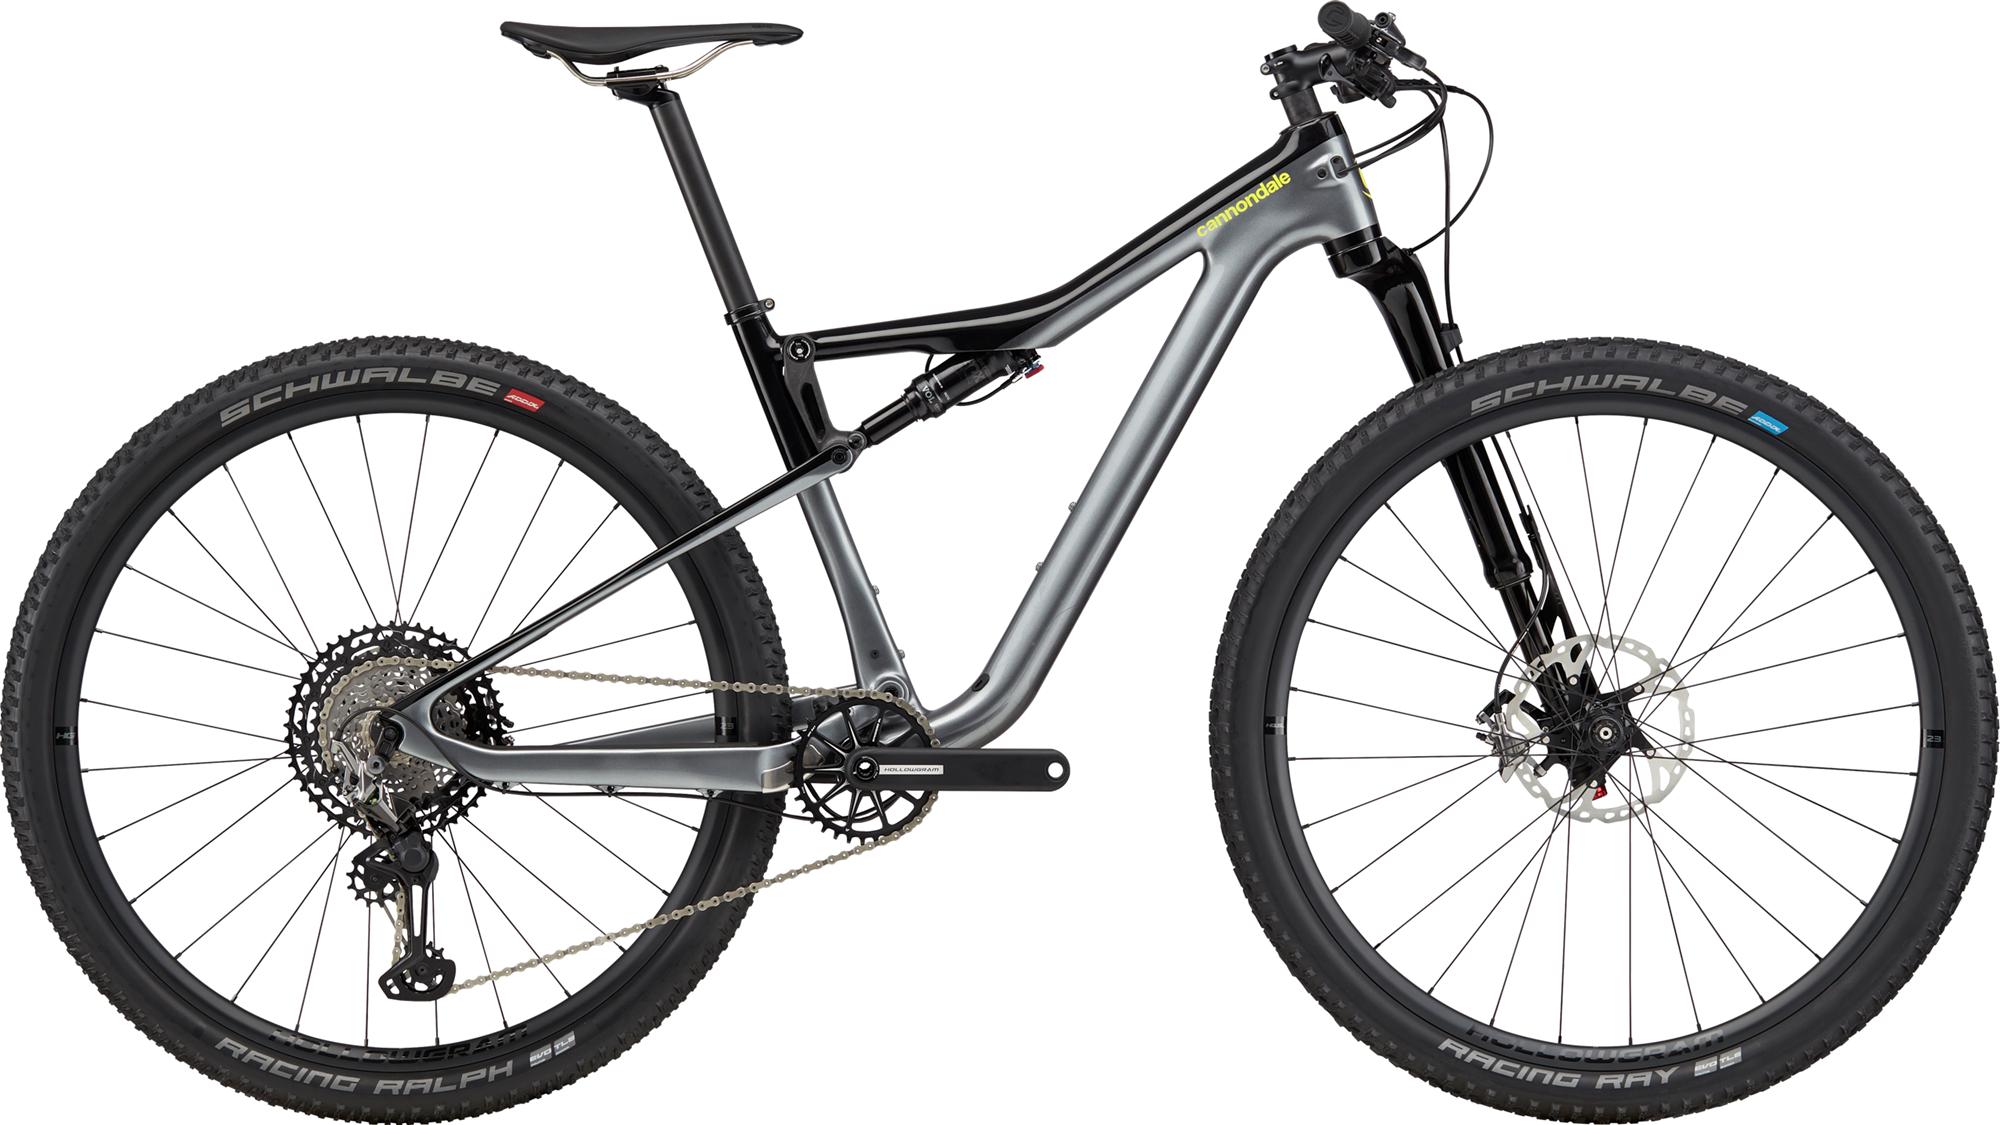 Cannondale Scalpel Si Carbon XT Mountain Bike 2020 Charcoal Grey